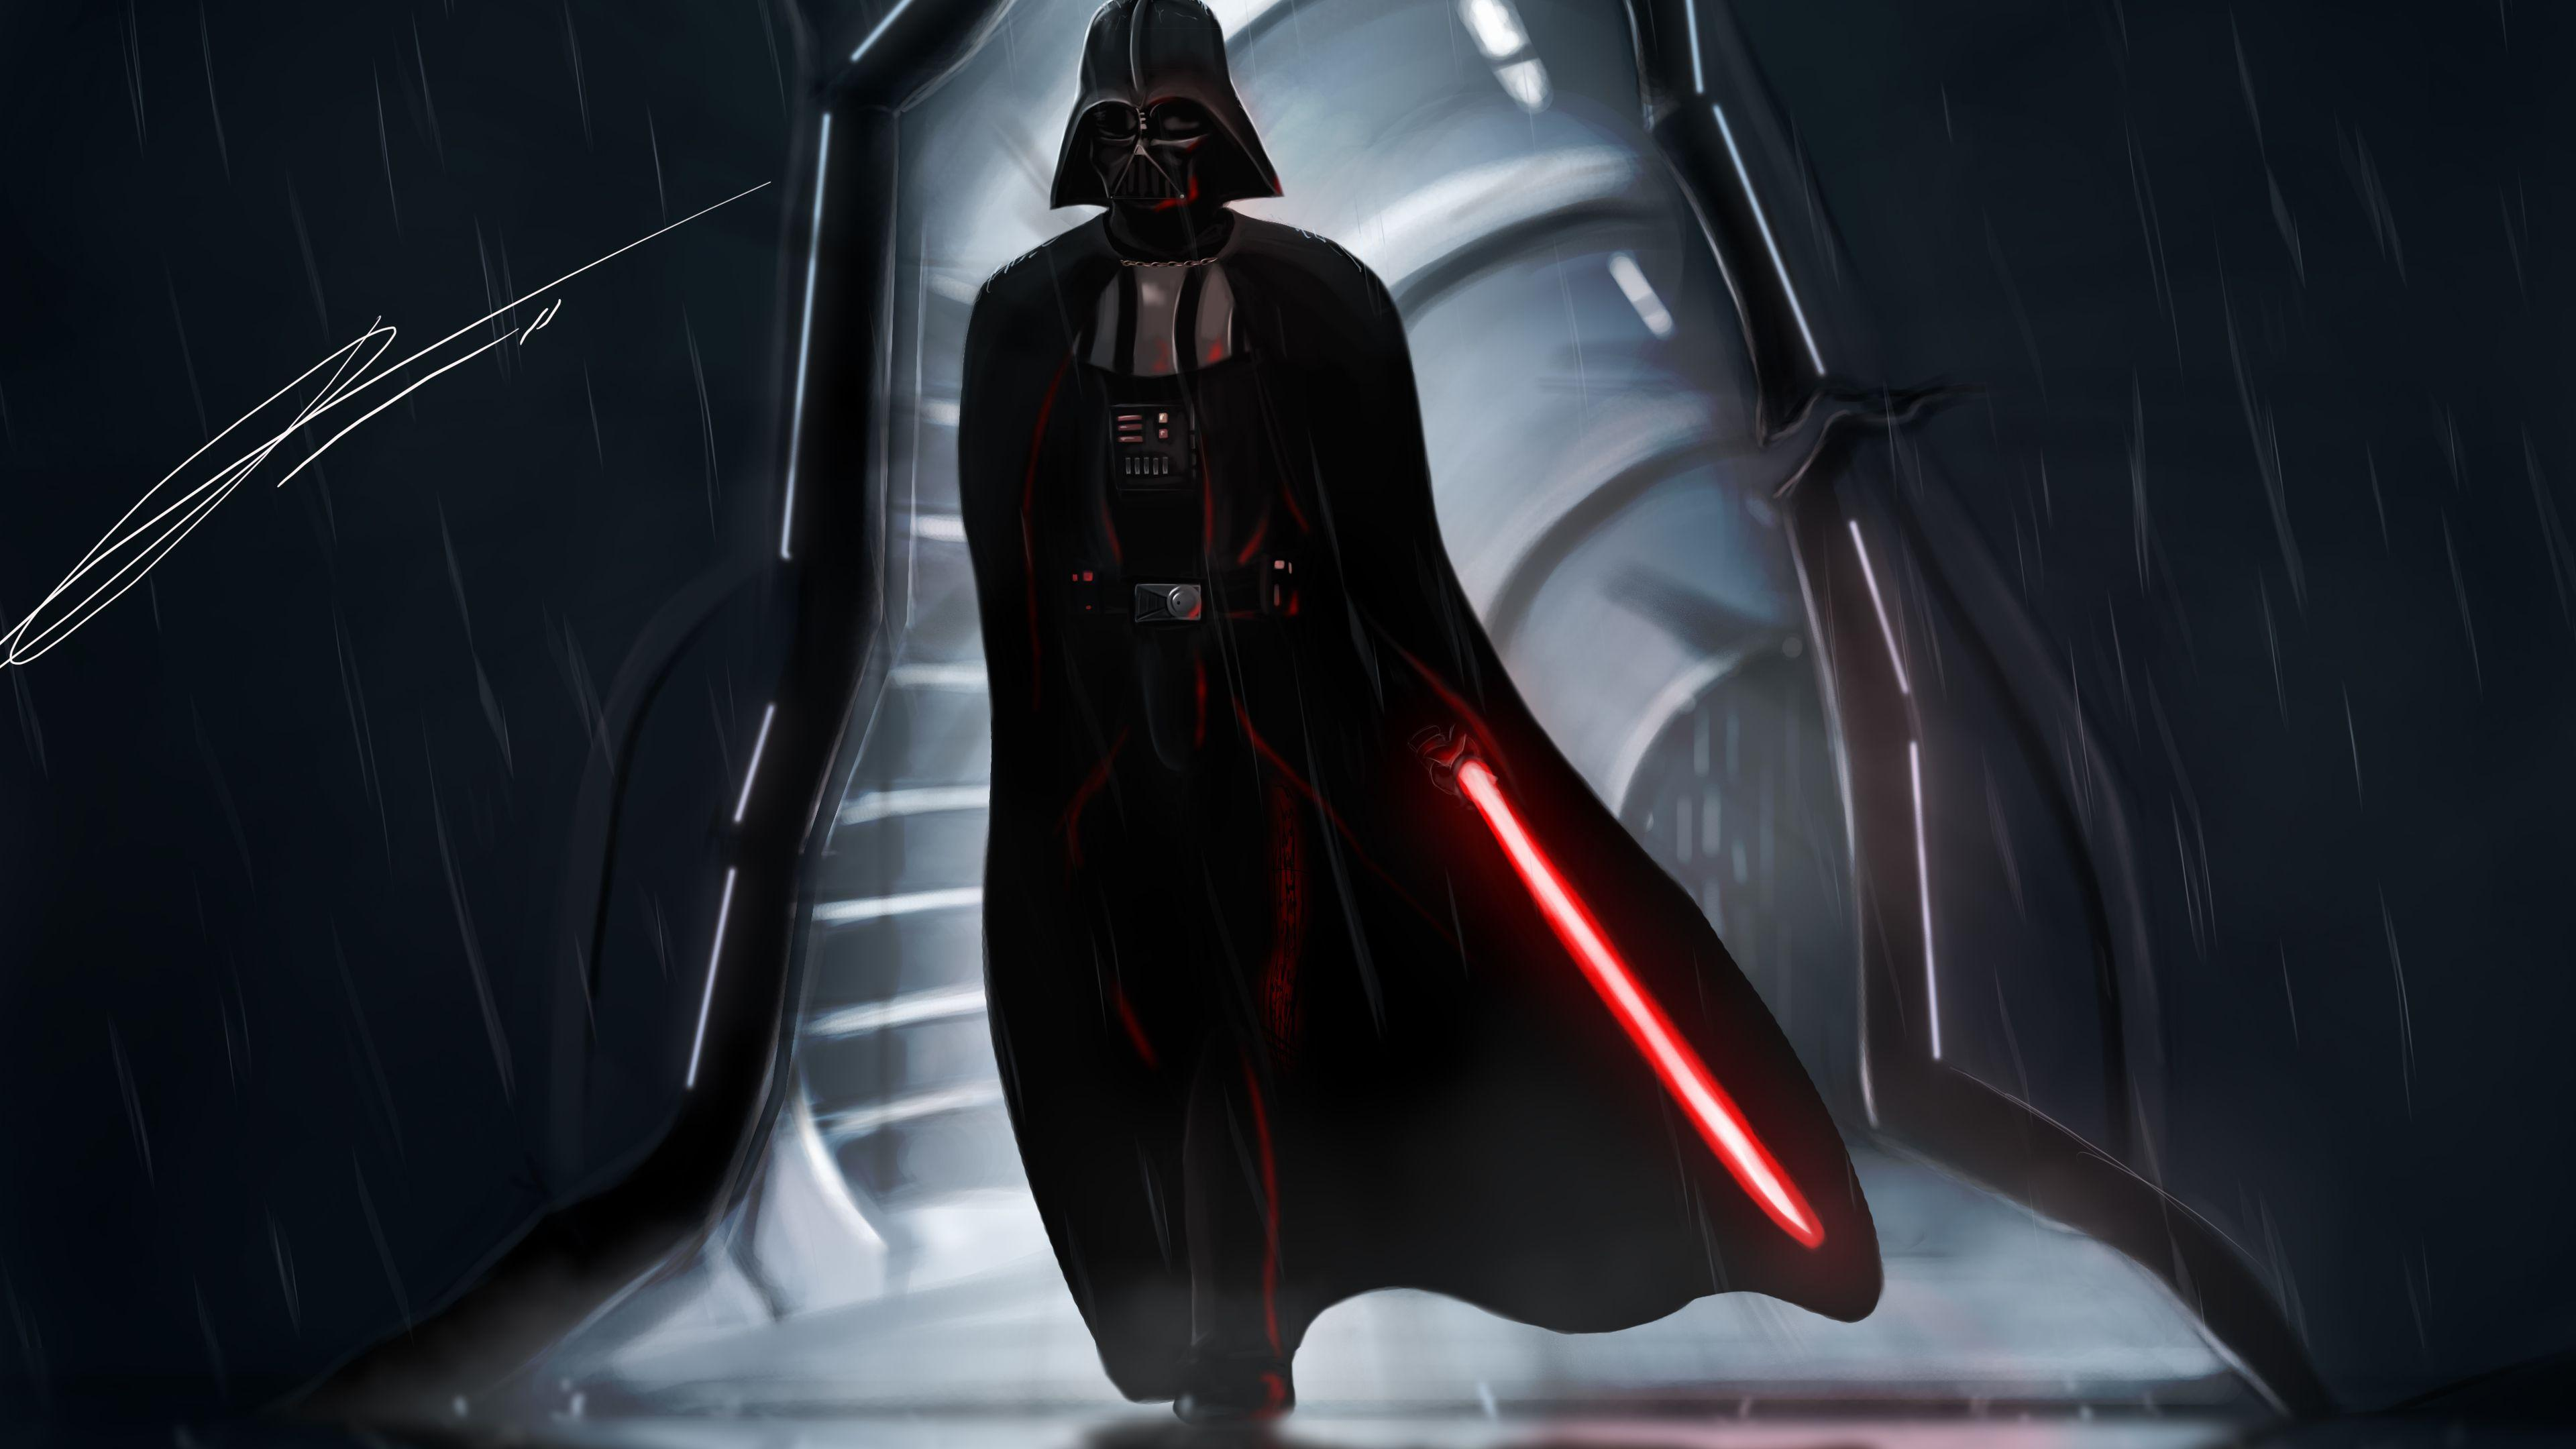 Darth Vader Star Wars Art Wallpapers Wallpaper Cave